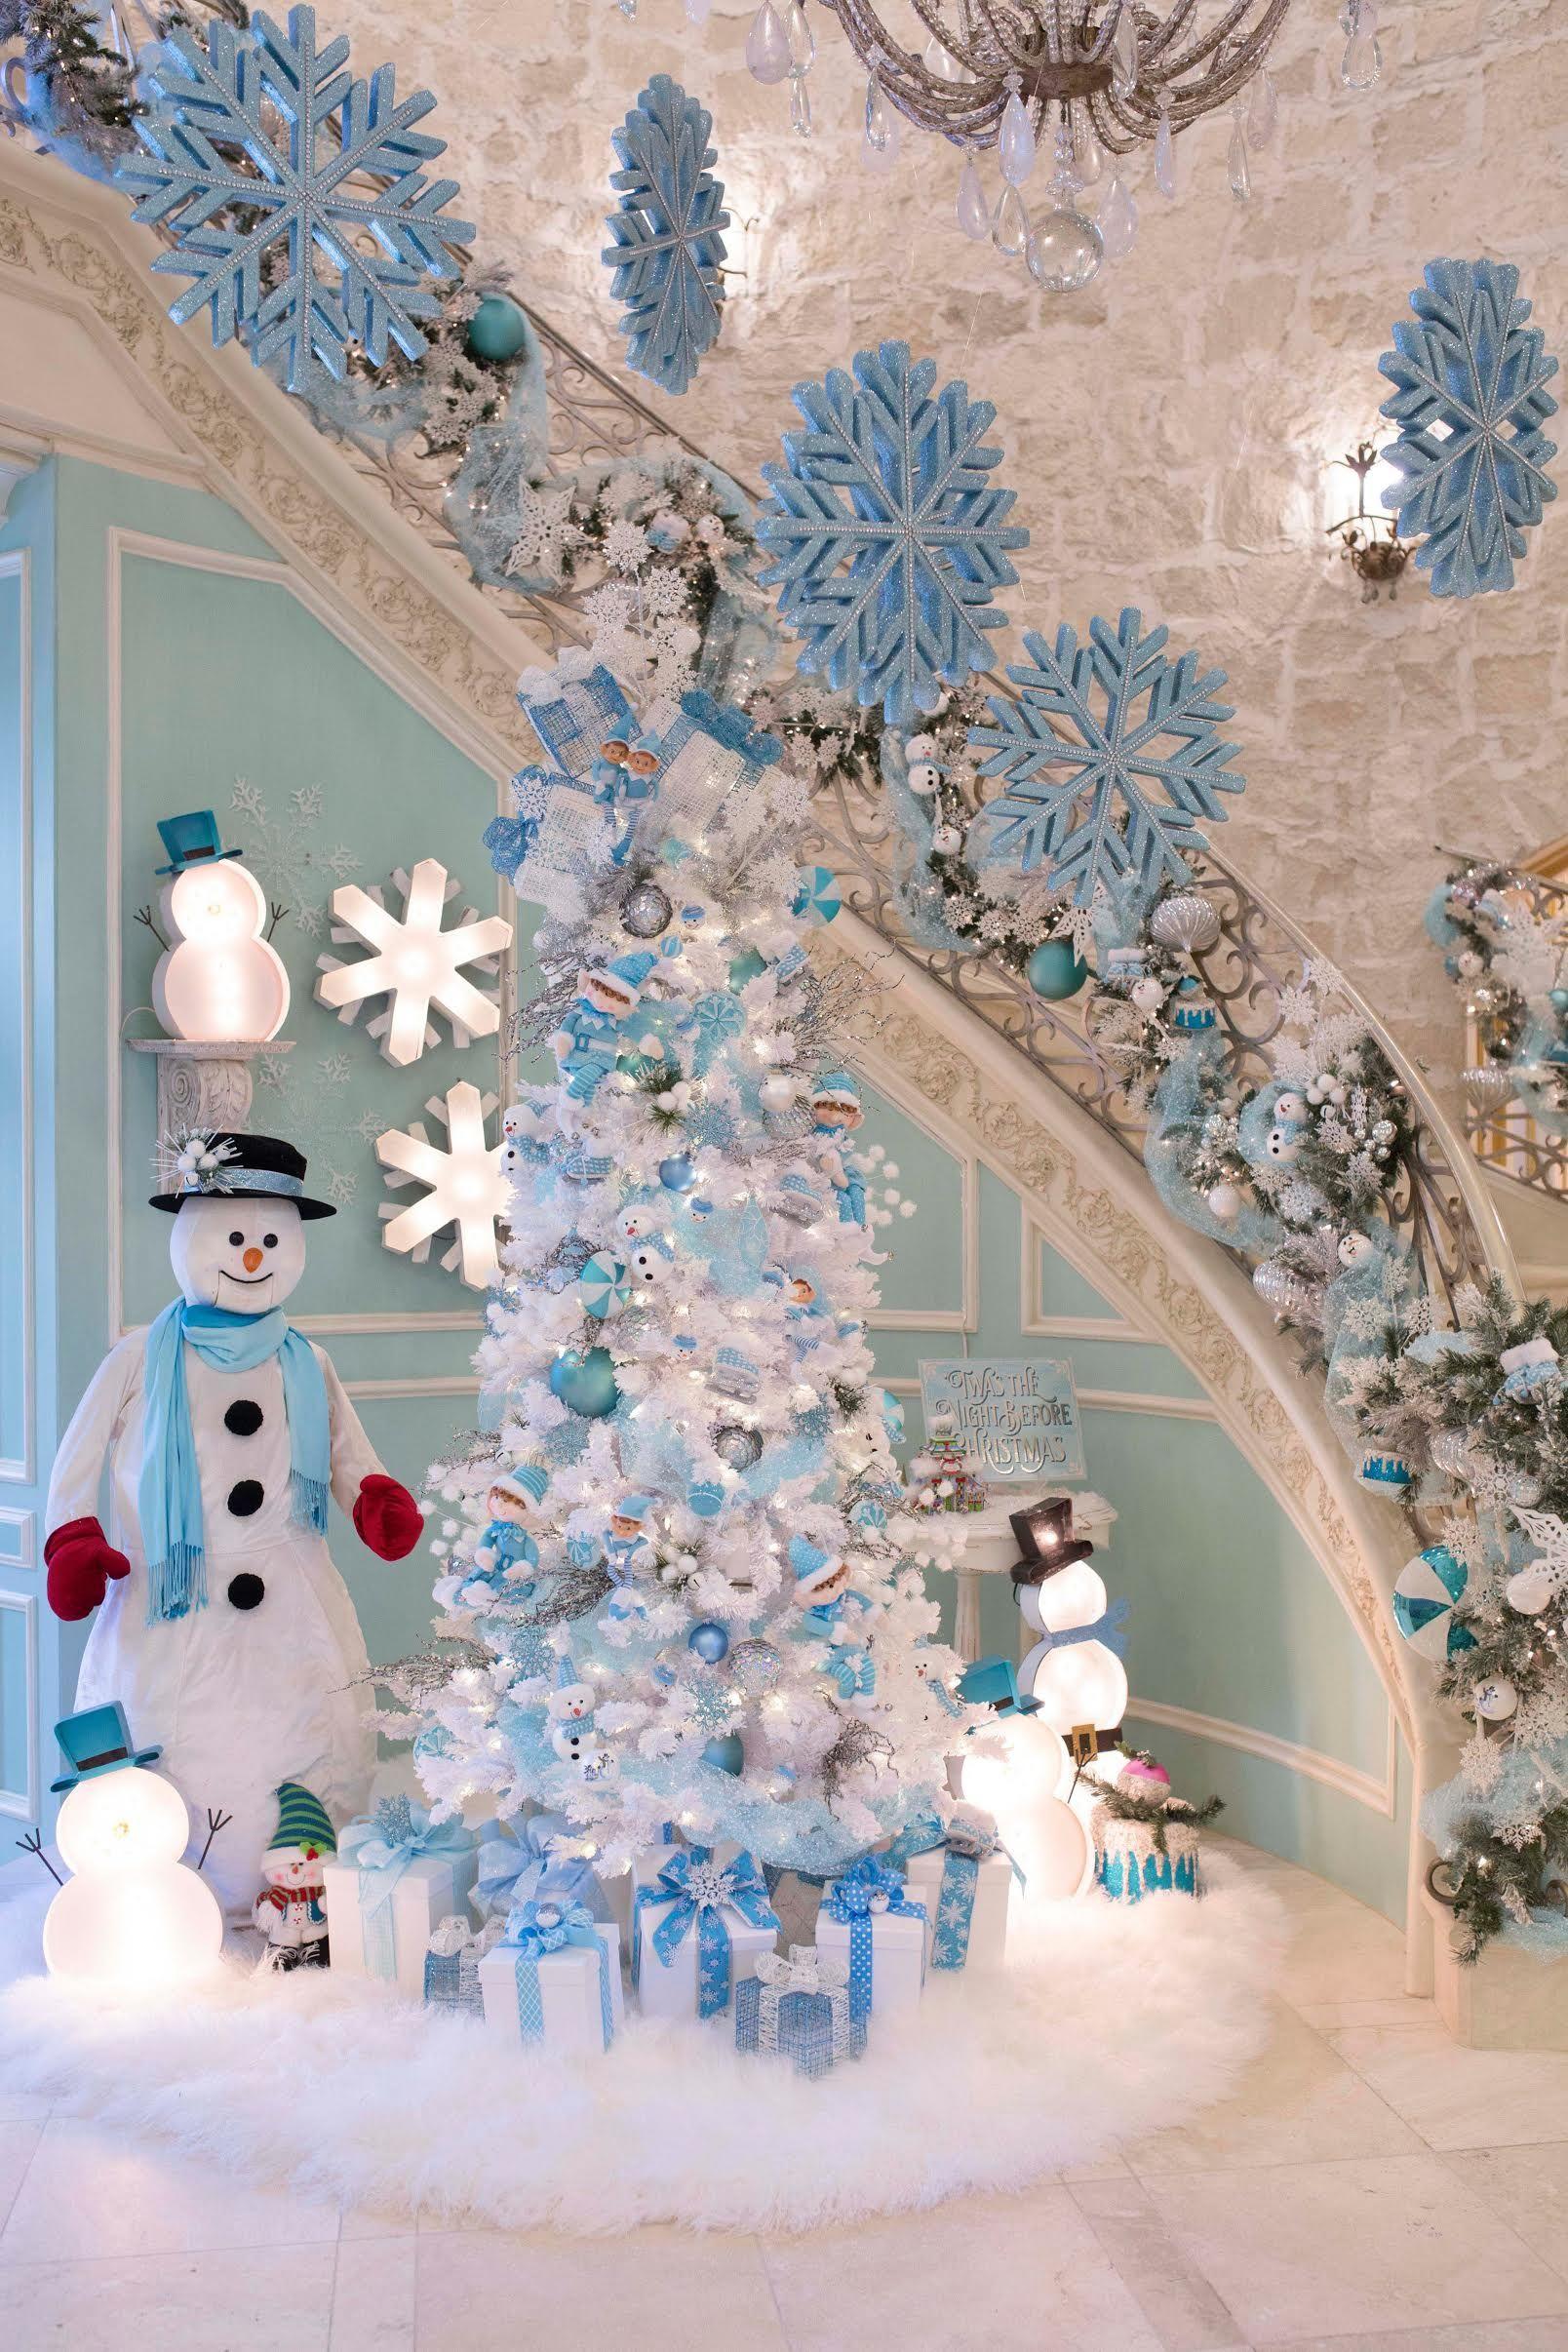 Pin by Jennifer McDonald on Home for Christmas | Pinterest | Blue ...